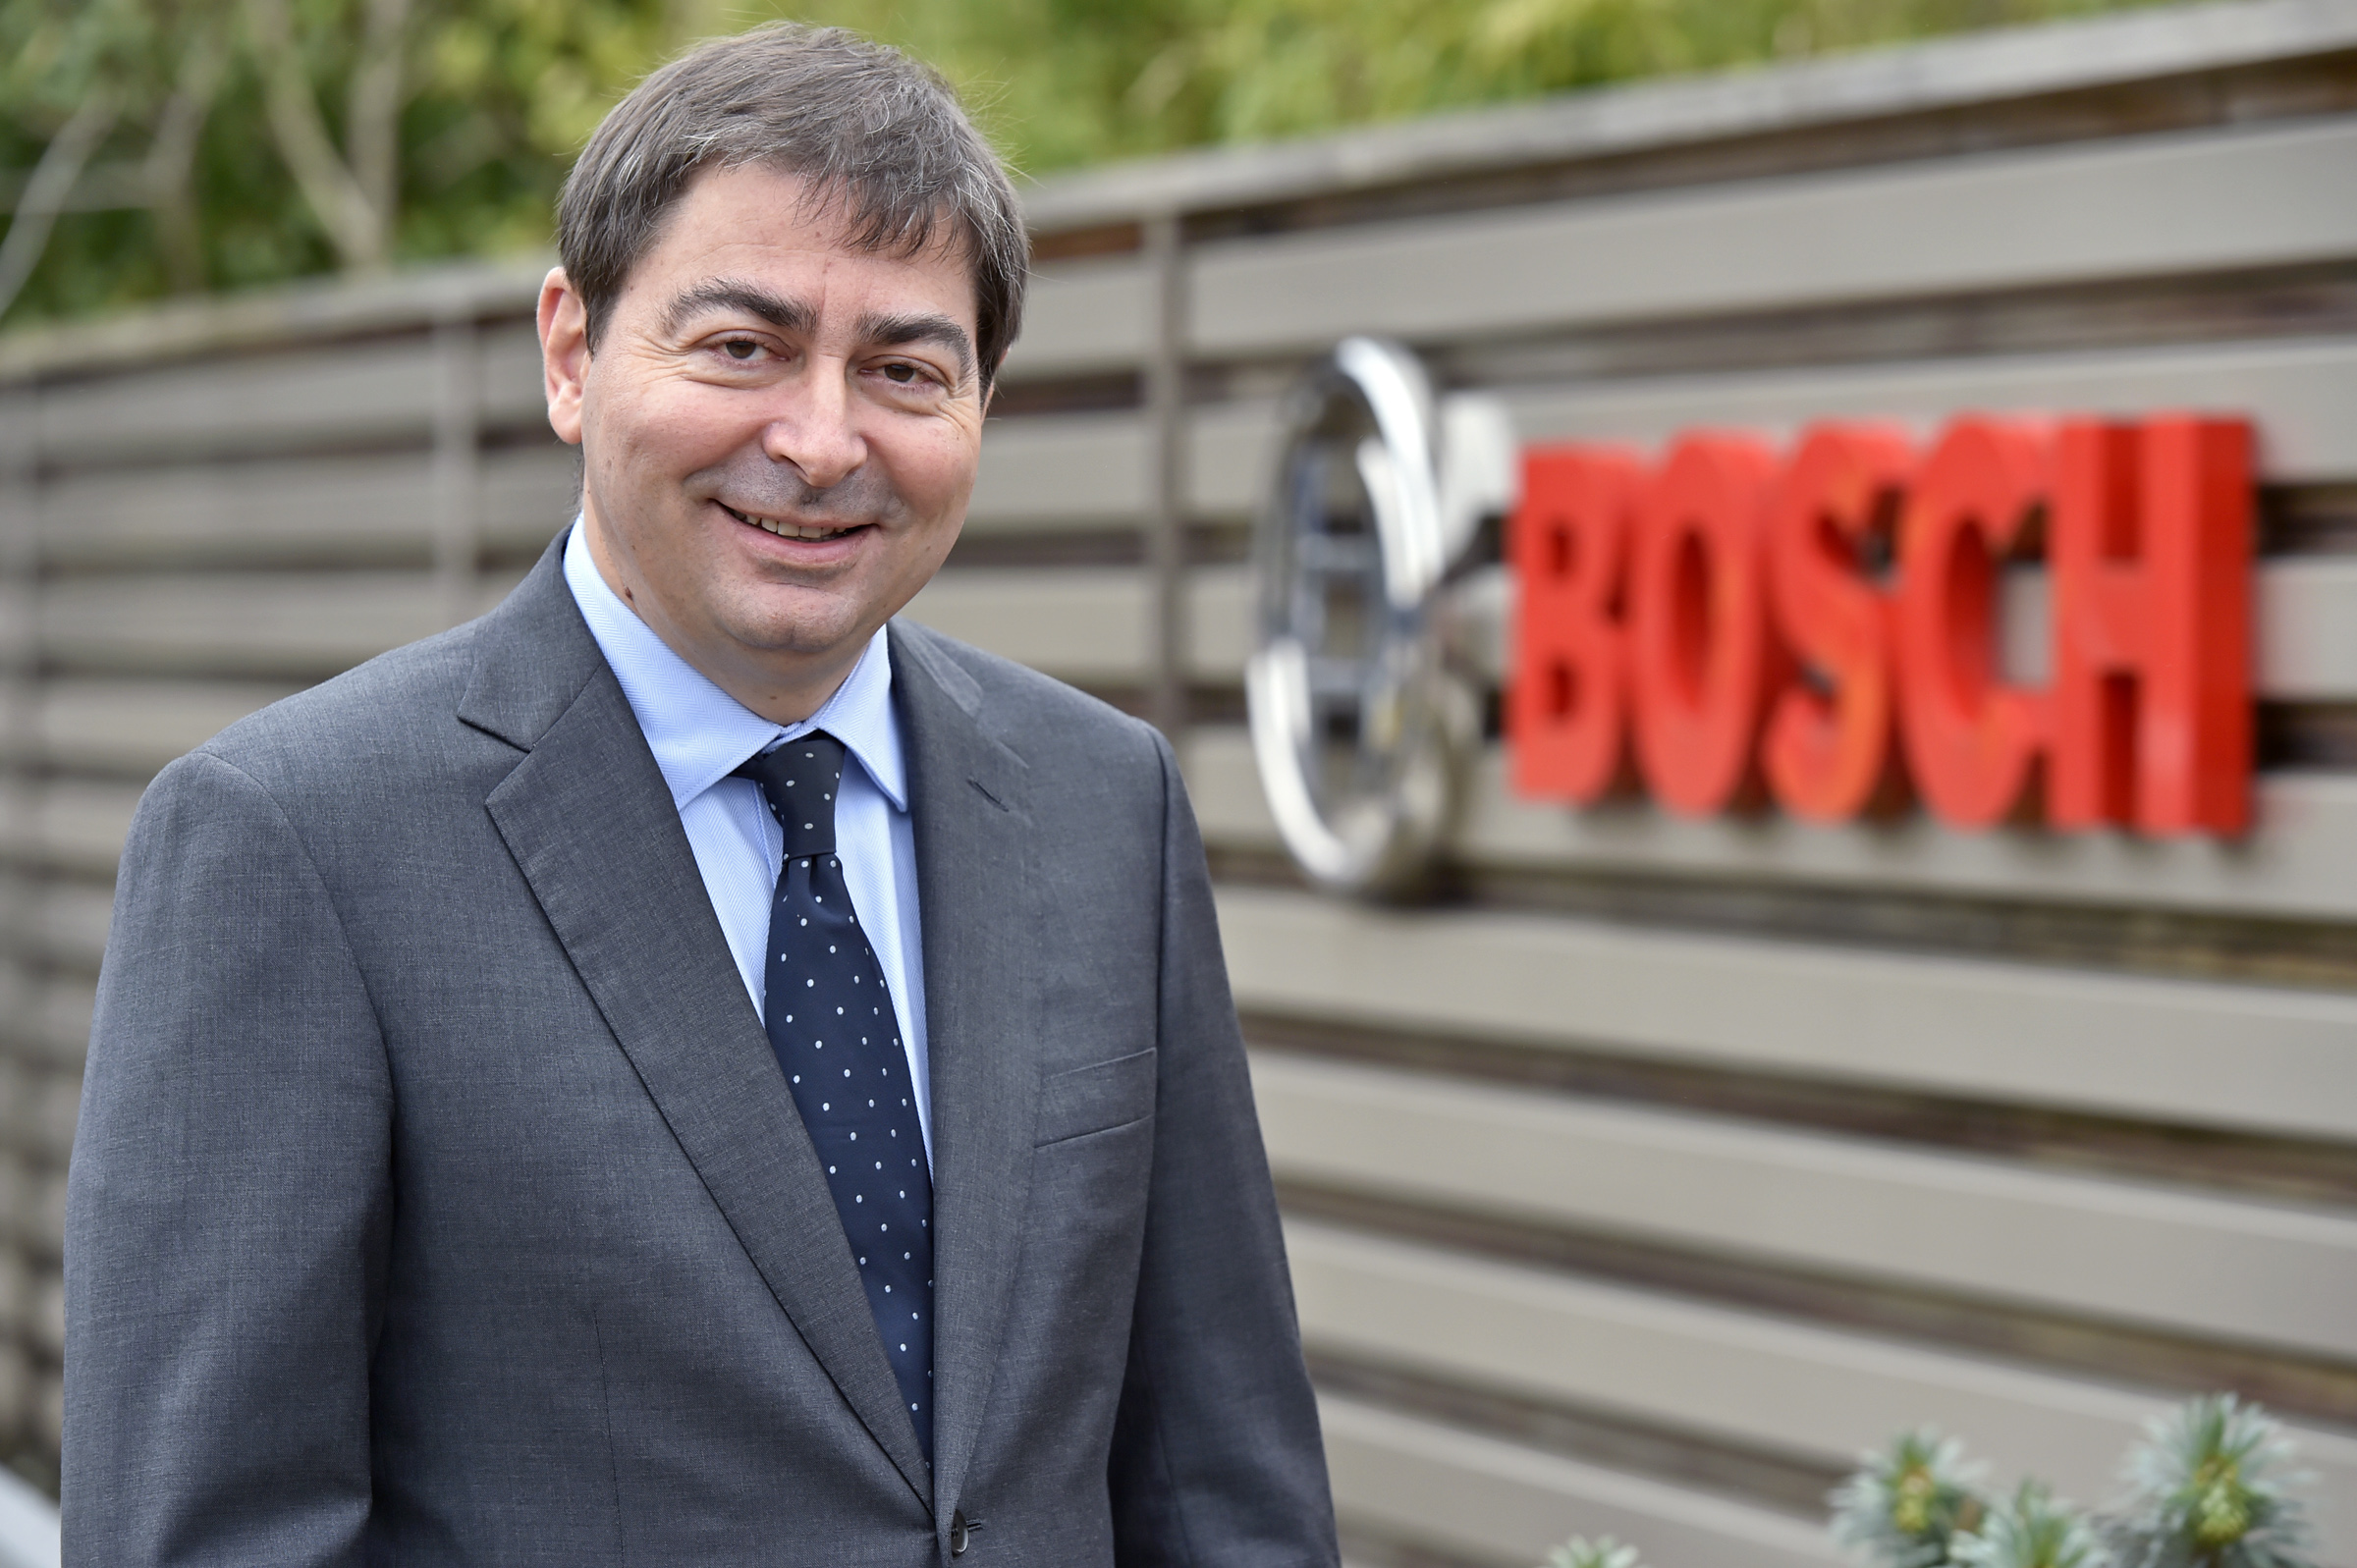 Steffen Hoffmann, president of Bosch in the UK